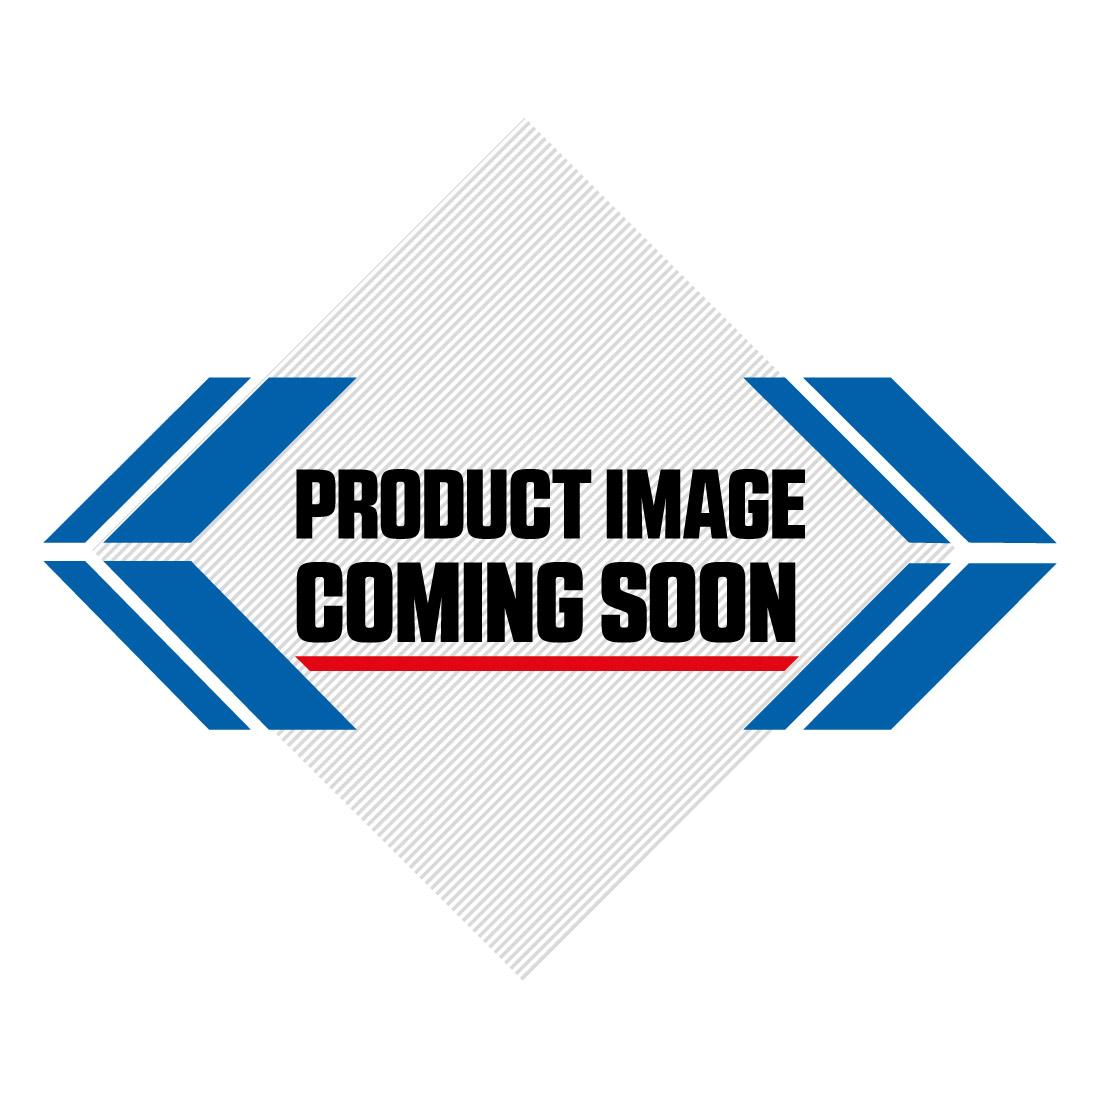 DJI Mavic 2 Pro Drone Image-4